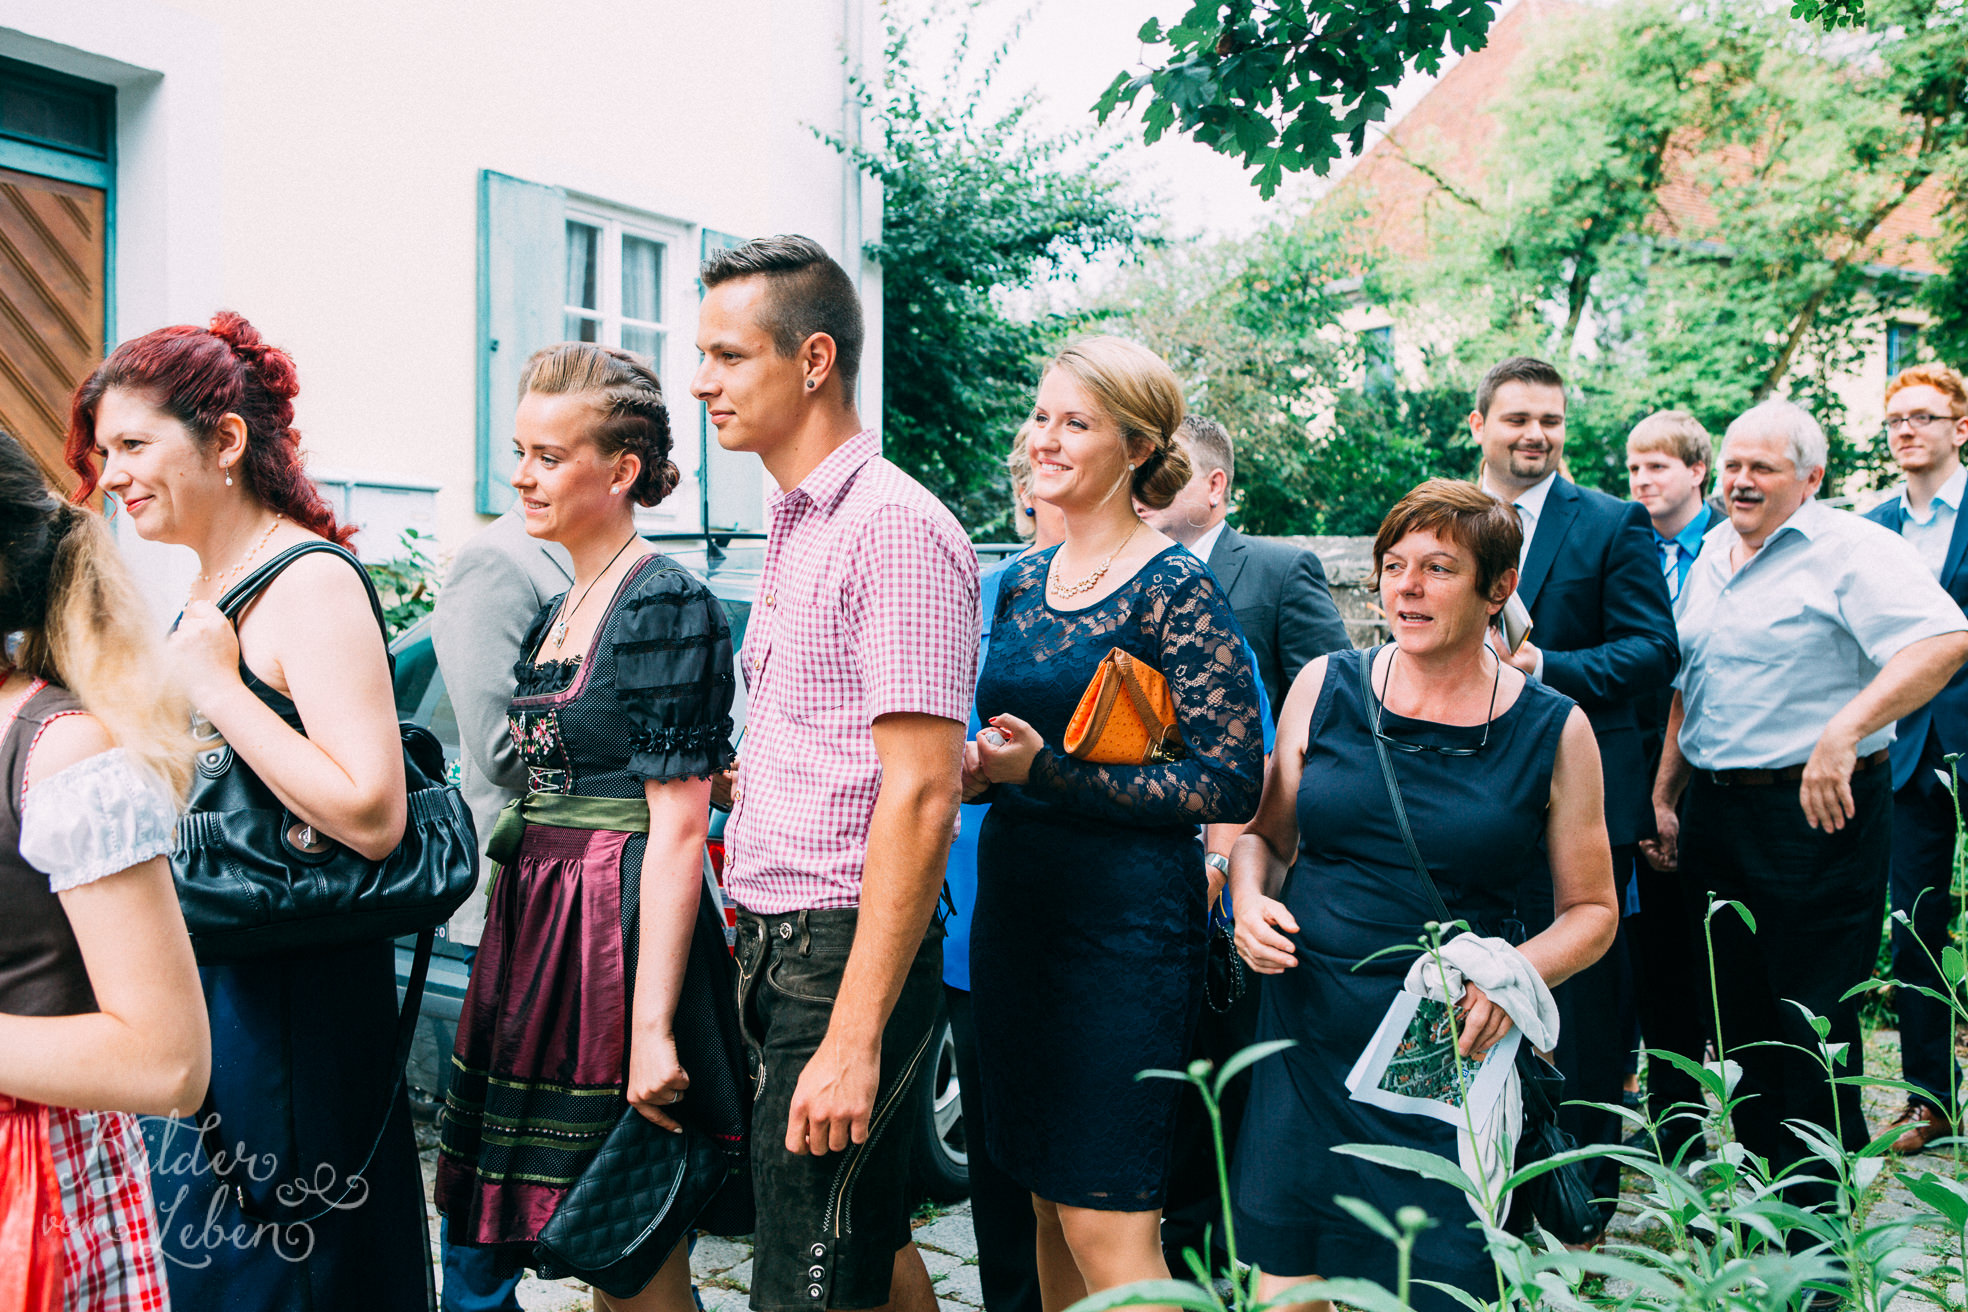 091BildervomLeben-Vintagehochzeit-Noerdlingen-2016